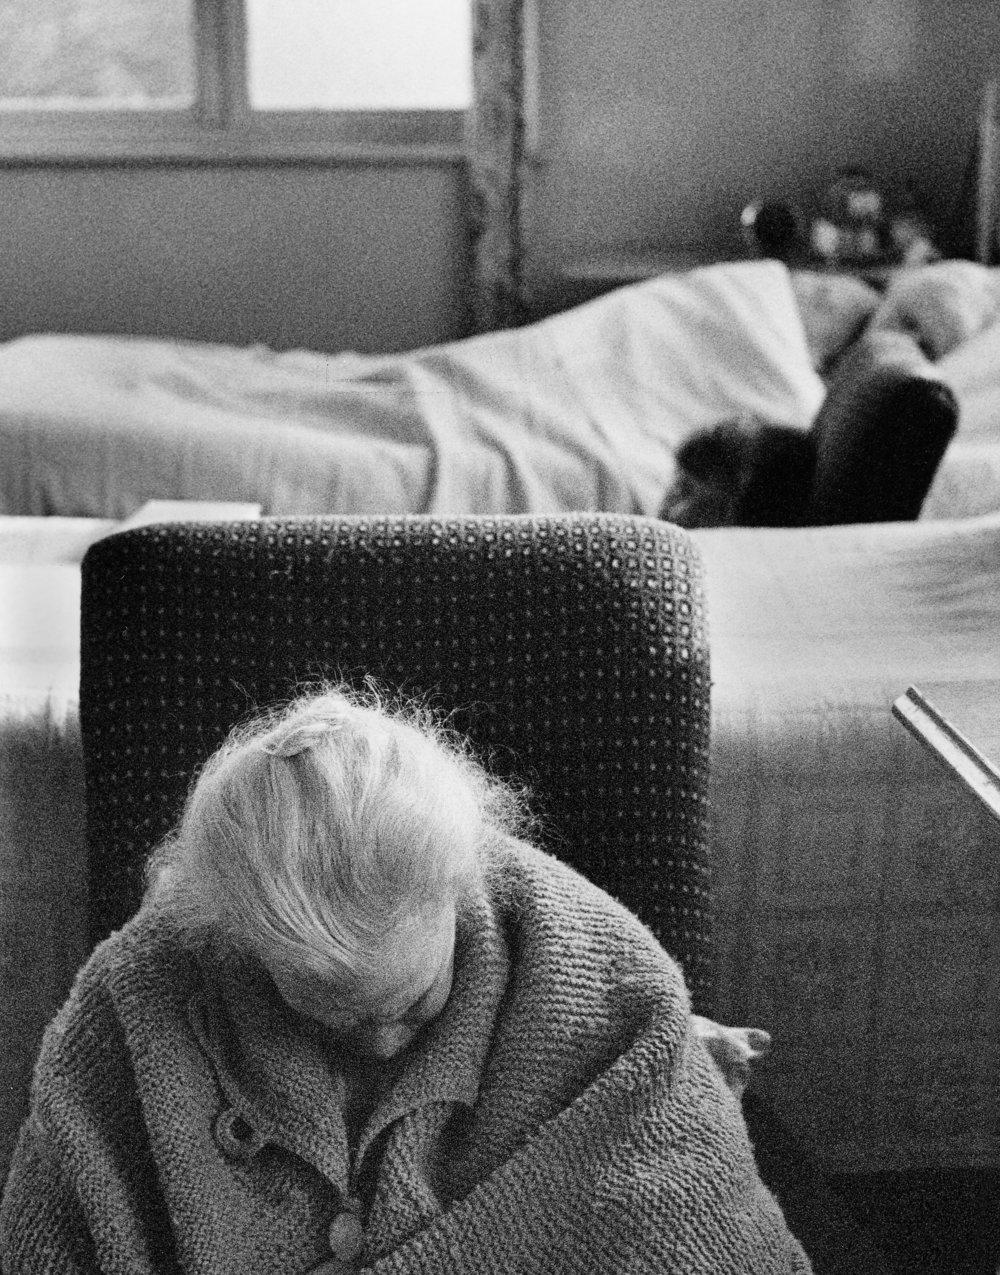 St. Joseph's Hosp., Mcr, Geriatric Ward, 18-43-9 (1964).jpg